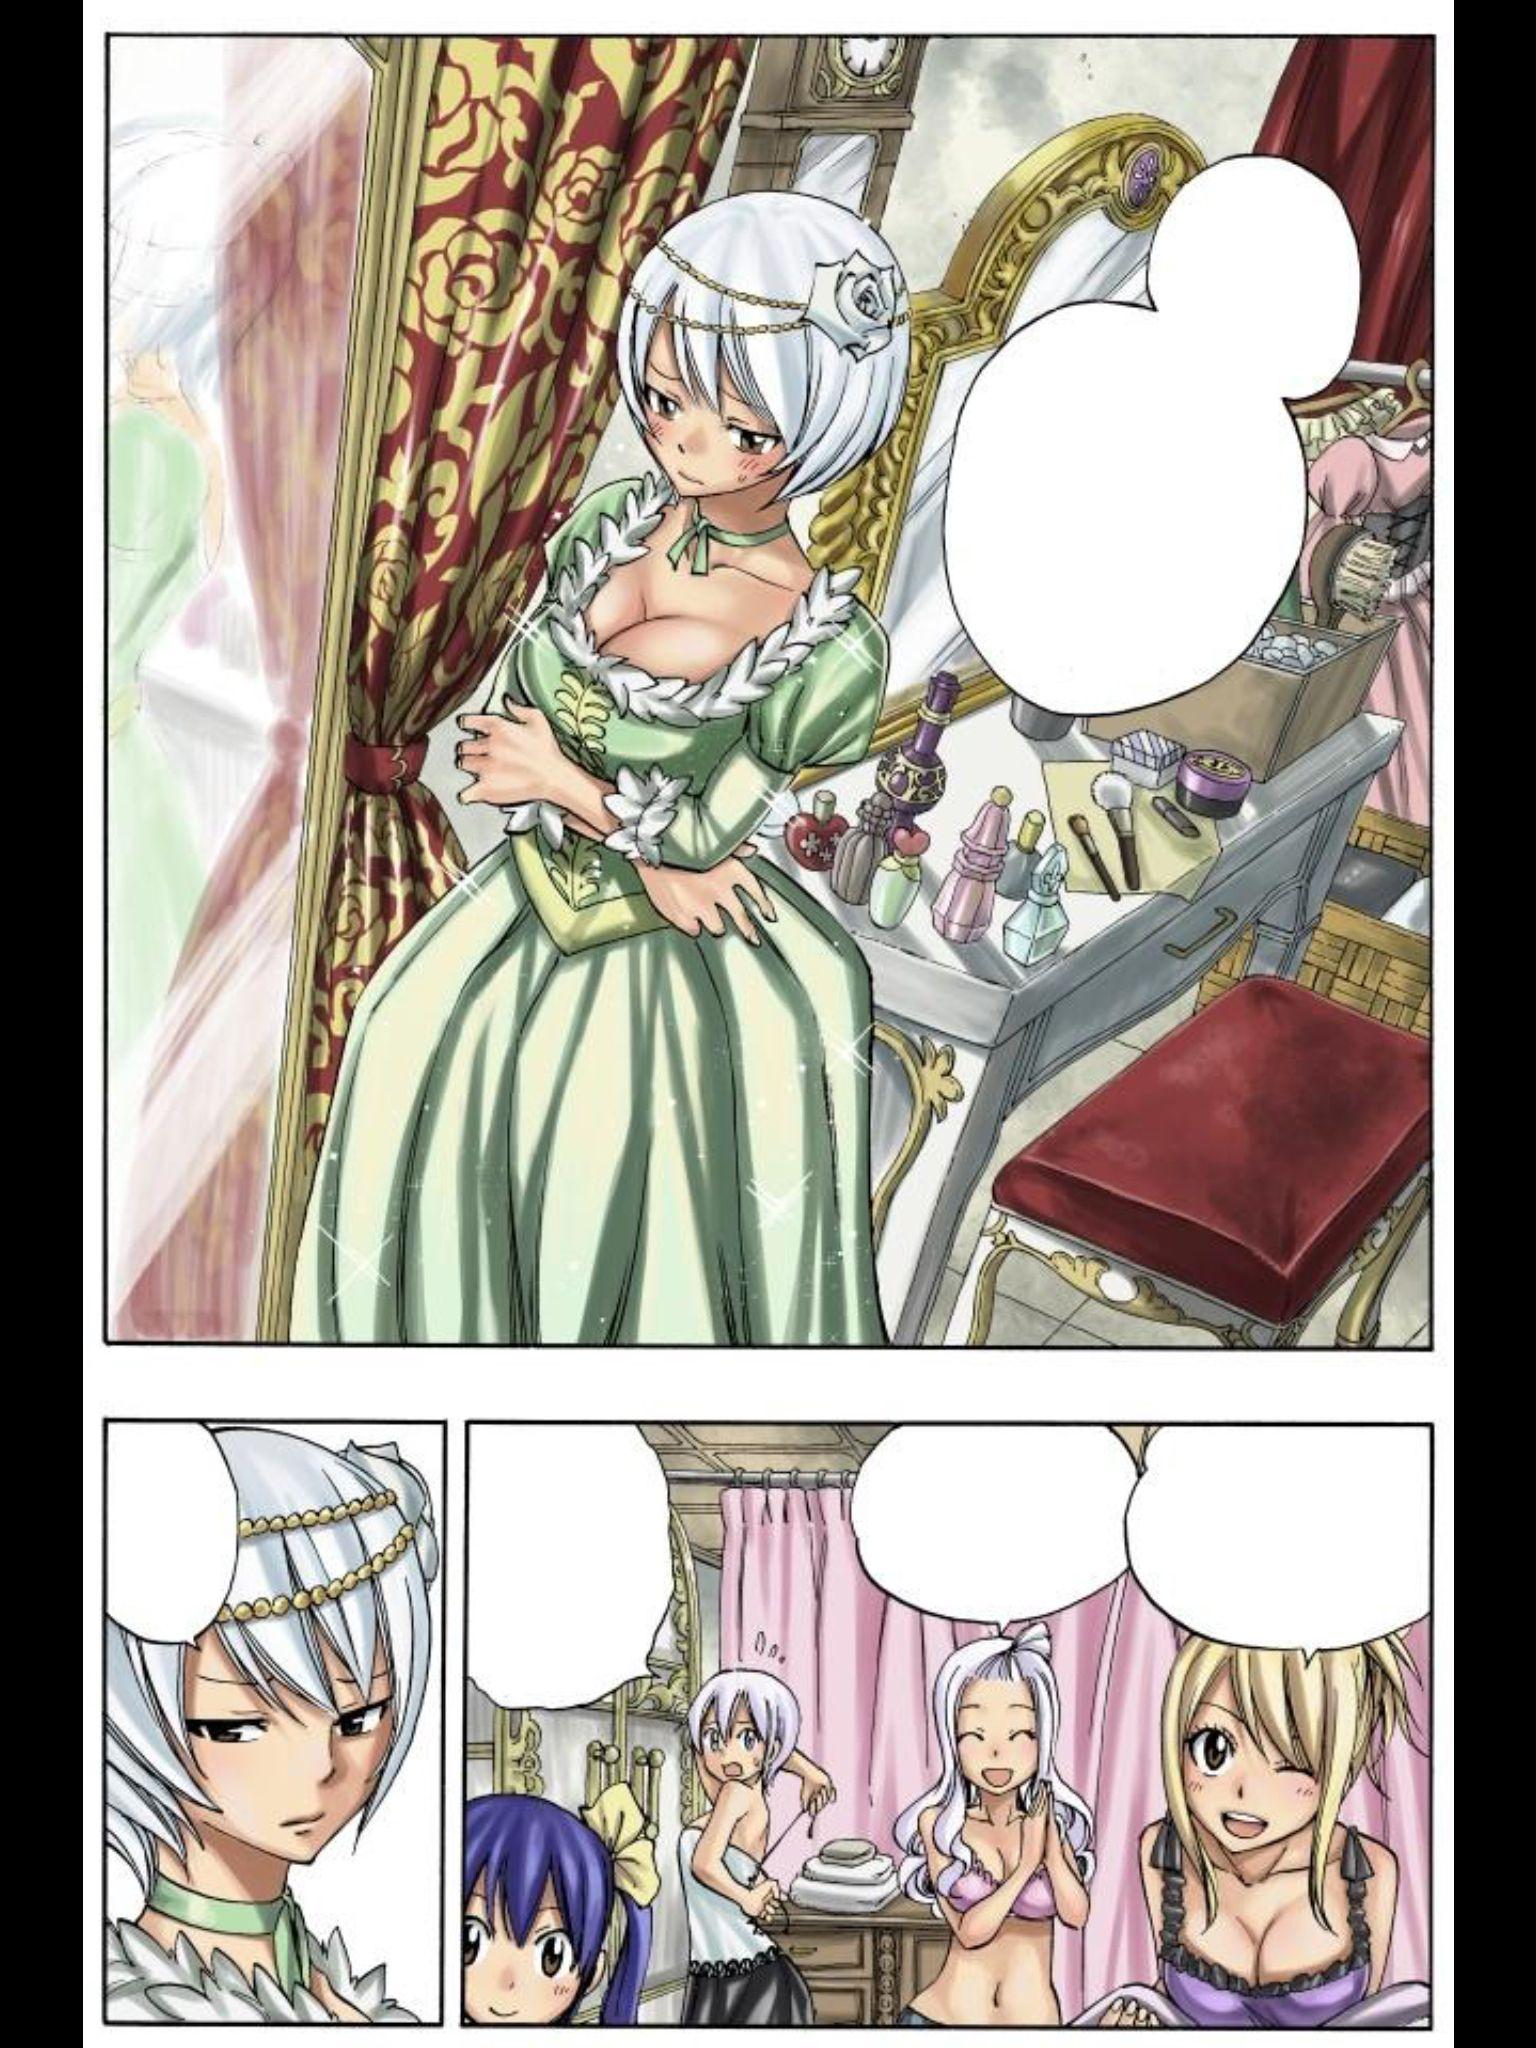 Fairy Tail.illustrated by Hiro Mashima